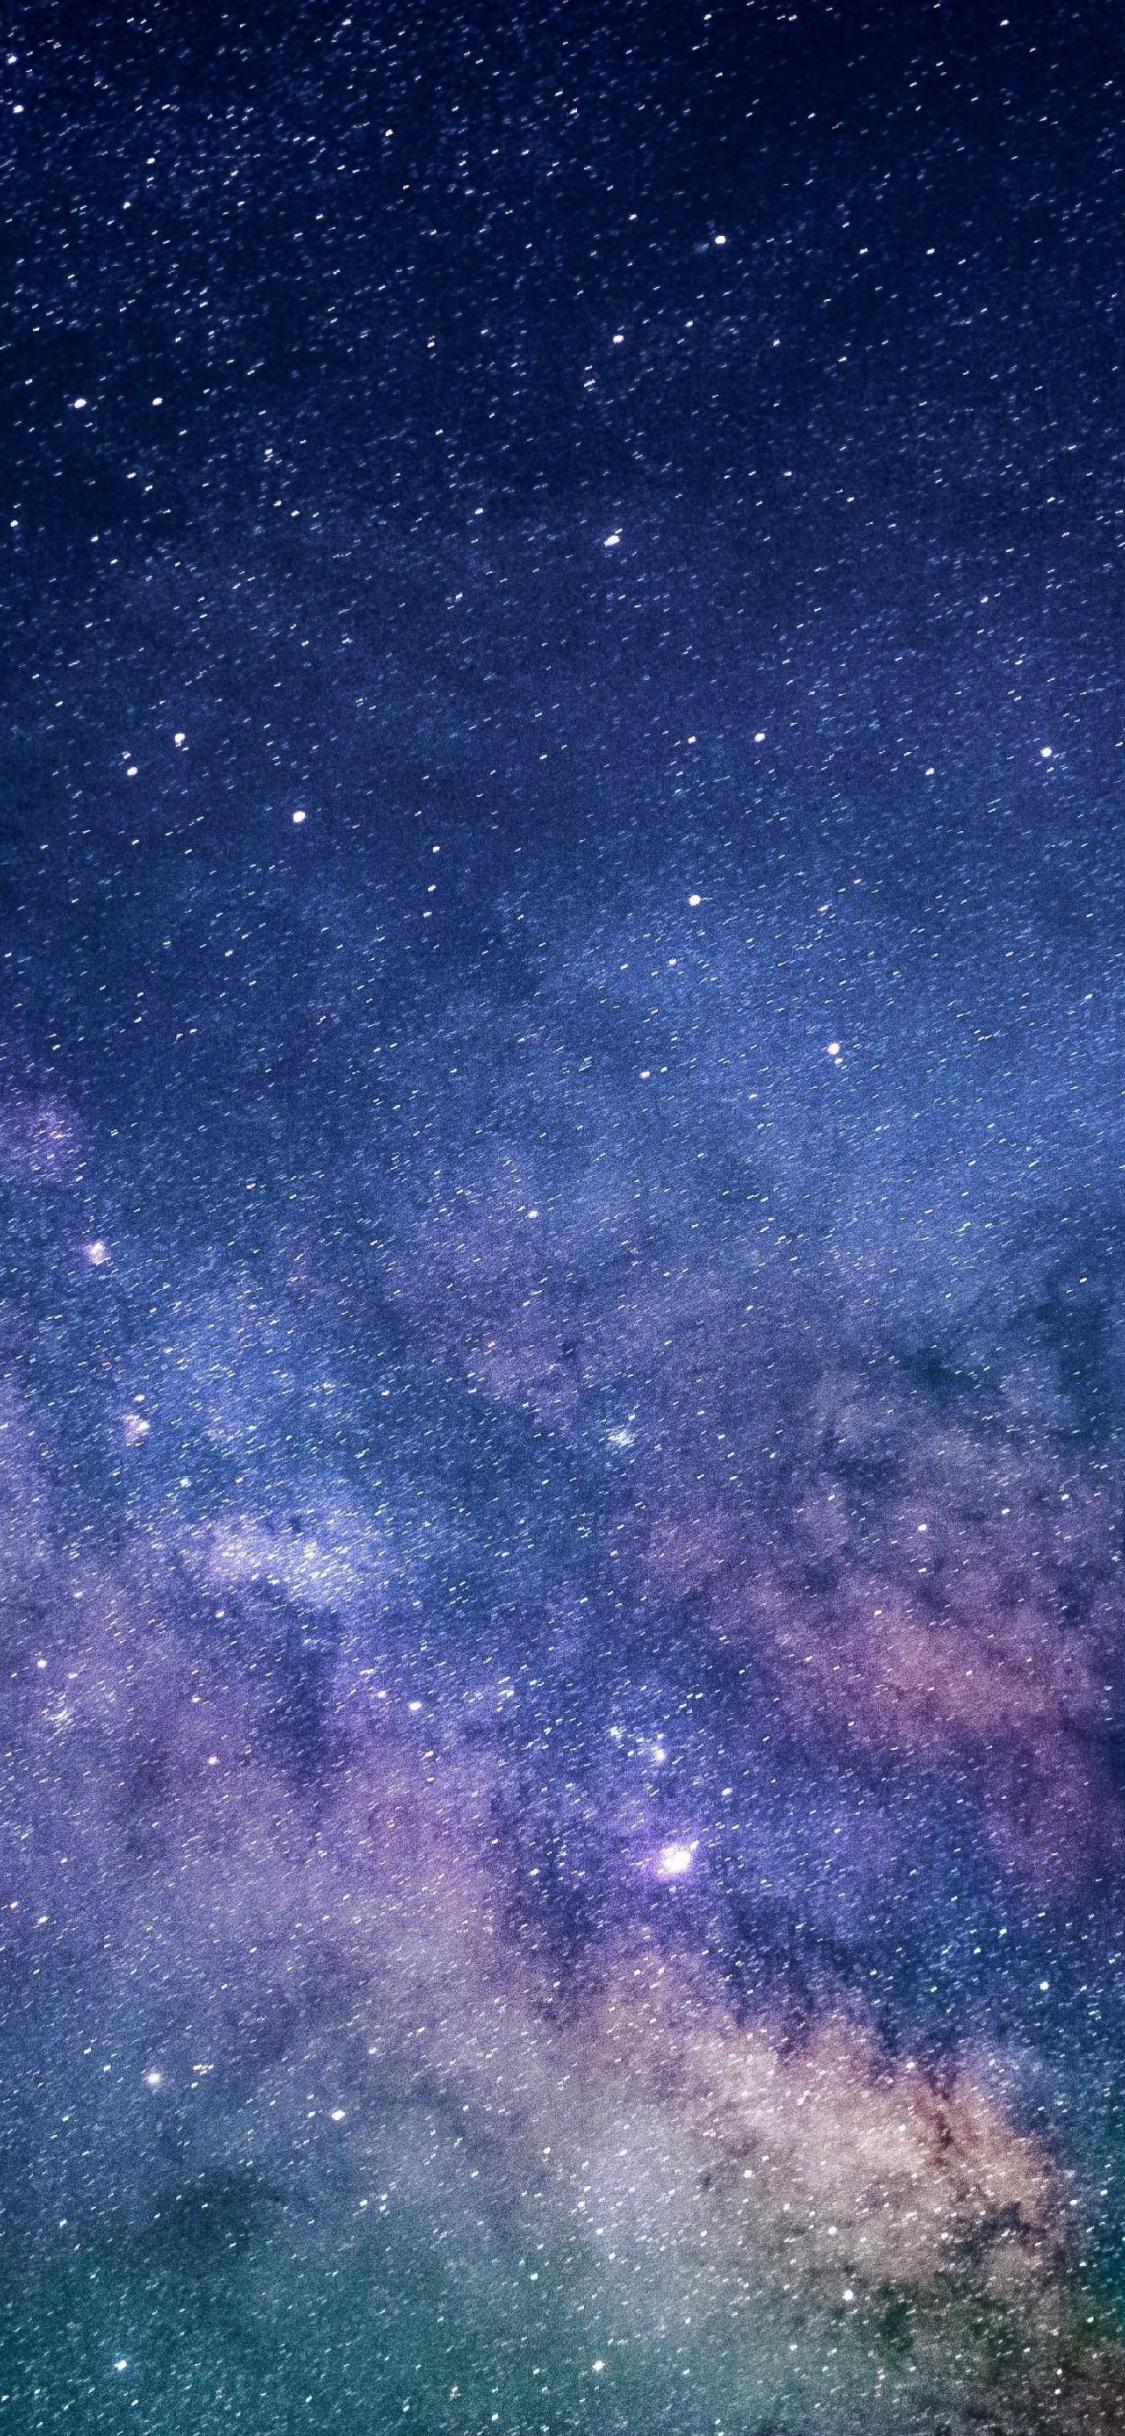 Download 1125x2436 Wallpaper Galaxy Milky Way Space Stars